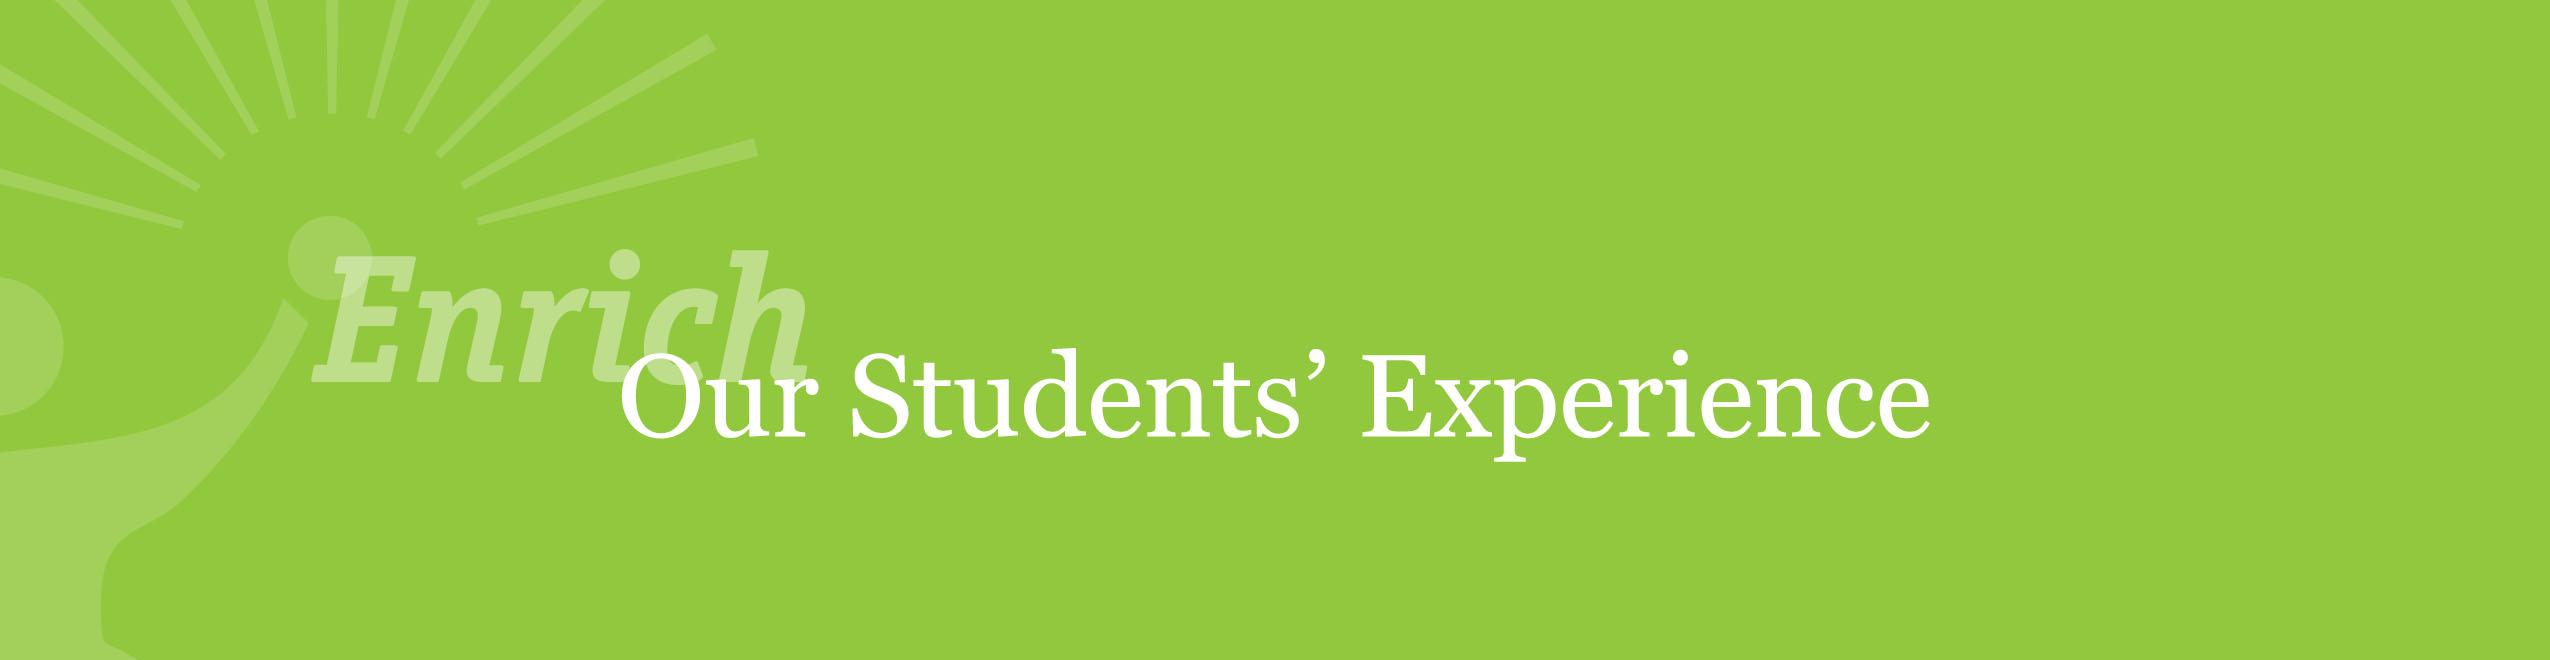 236638-Inserts-Students.jpg